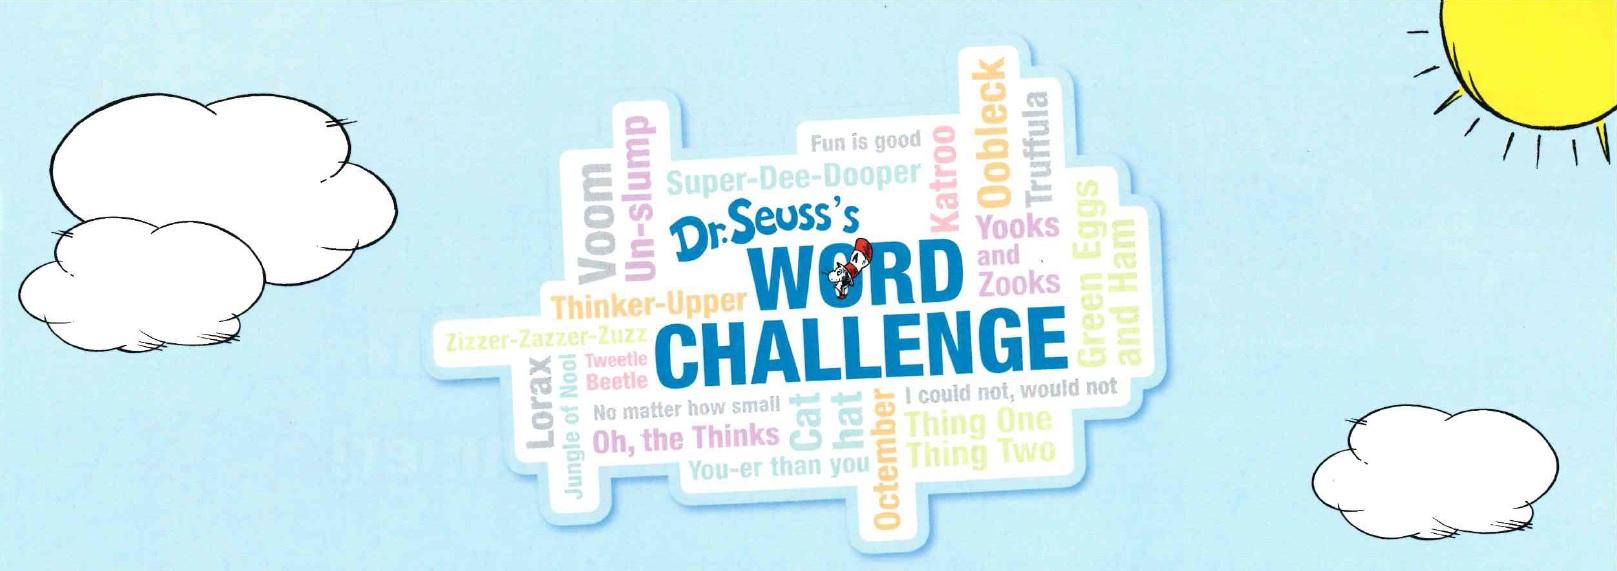 word-challenge-logo.jpg